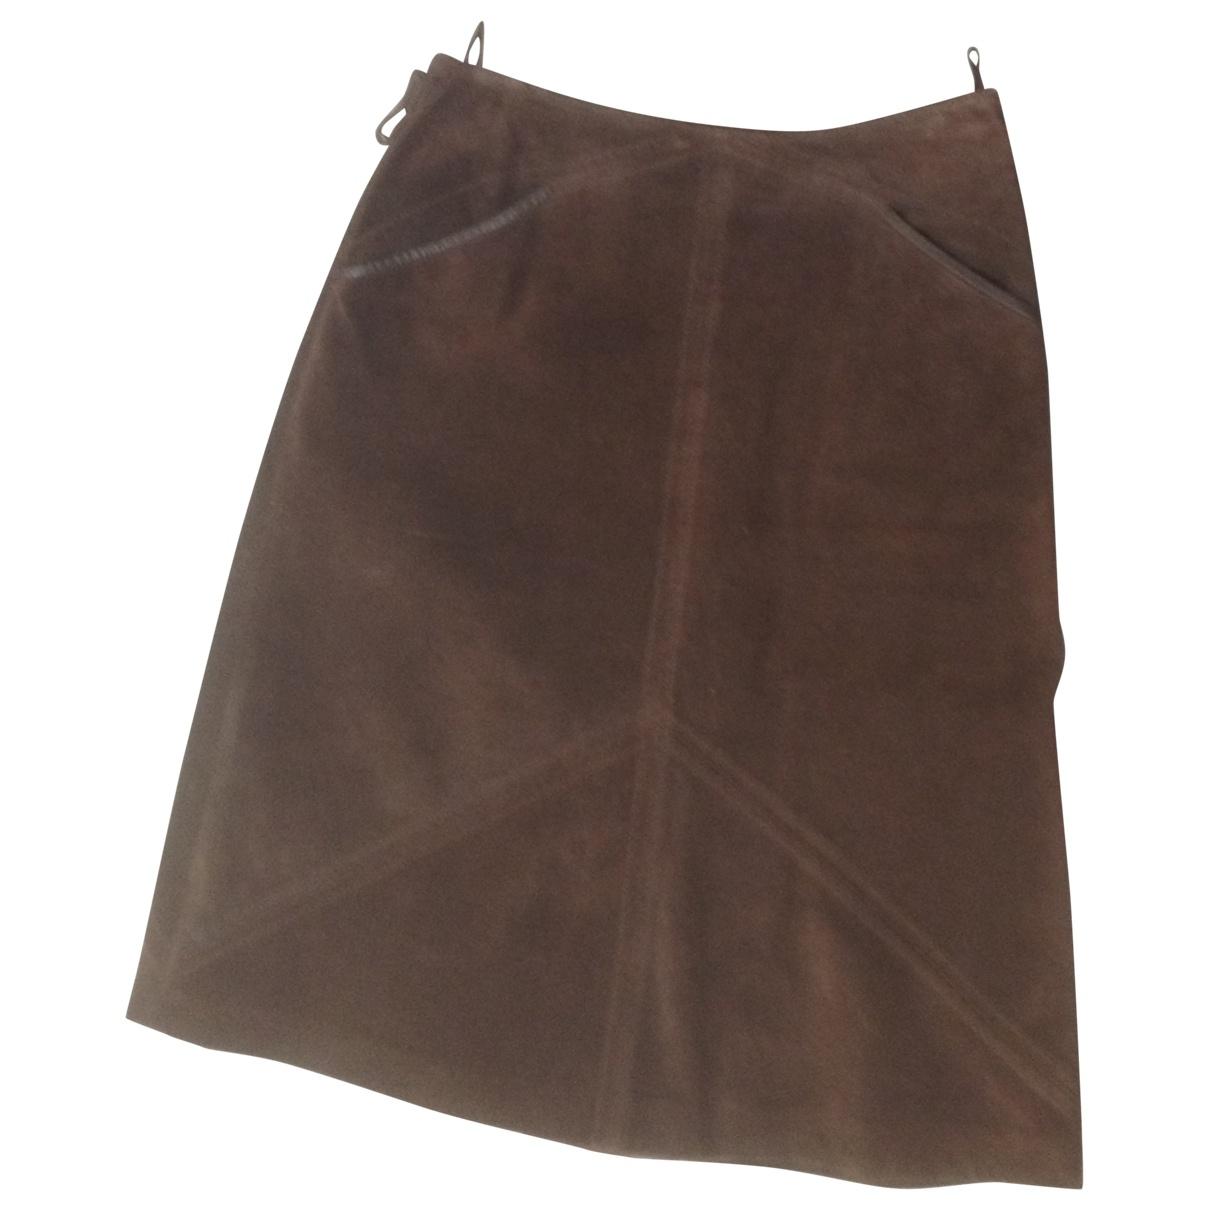 Max Mara \N Brown Suede skirt for Women 40 IT